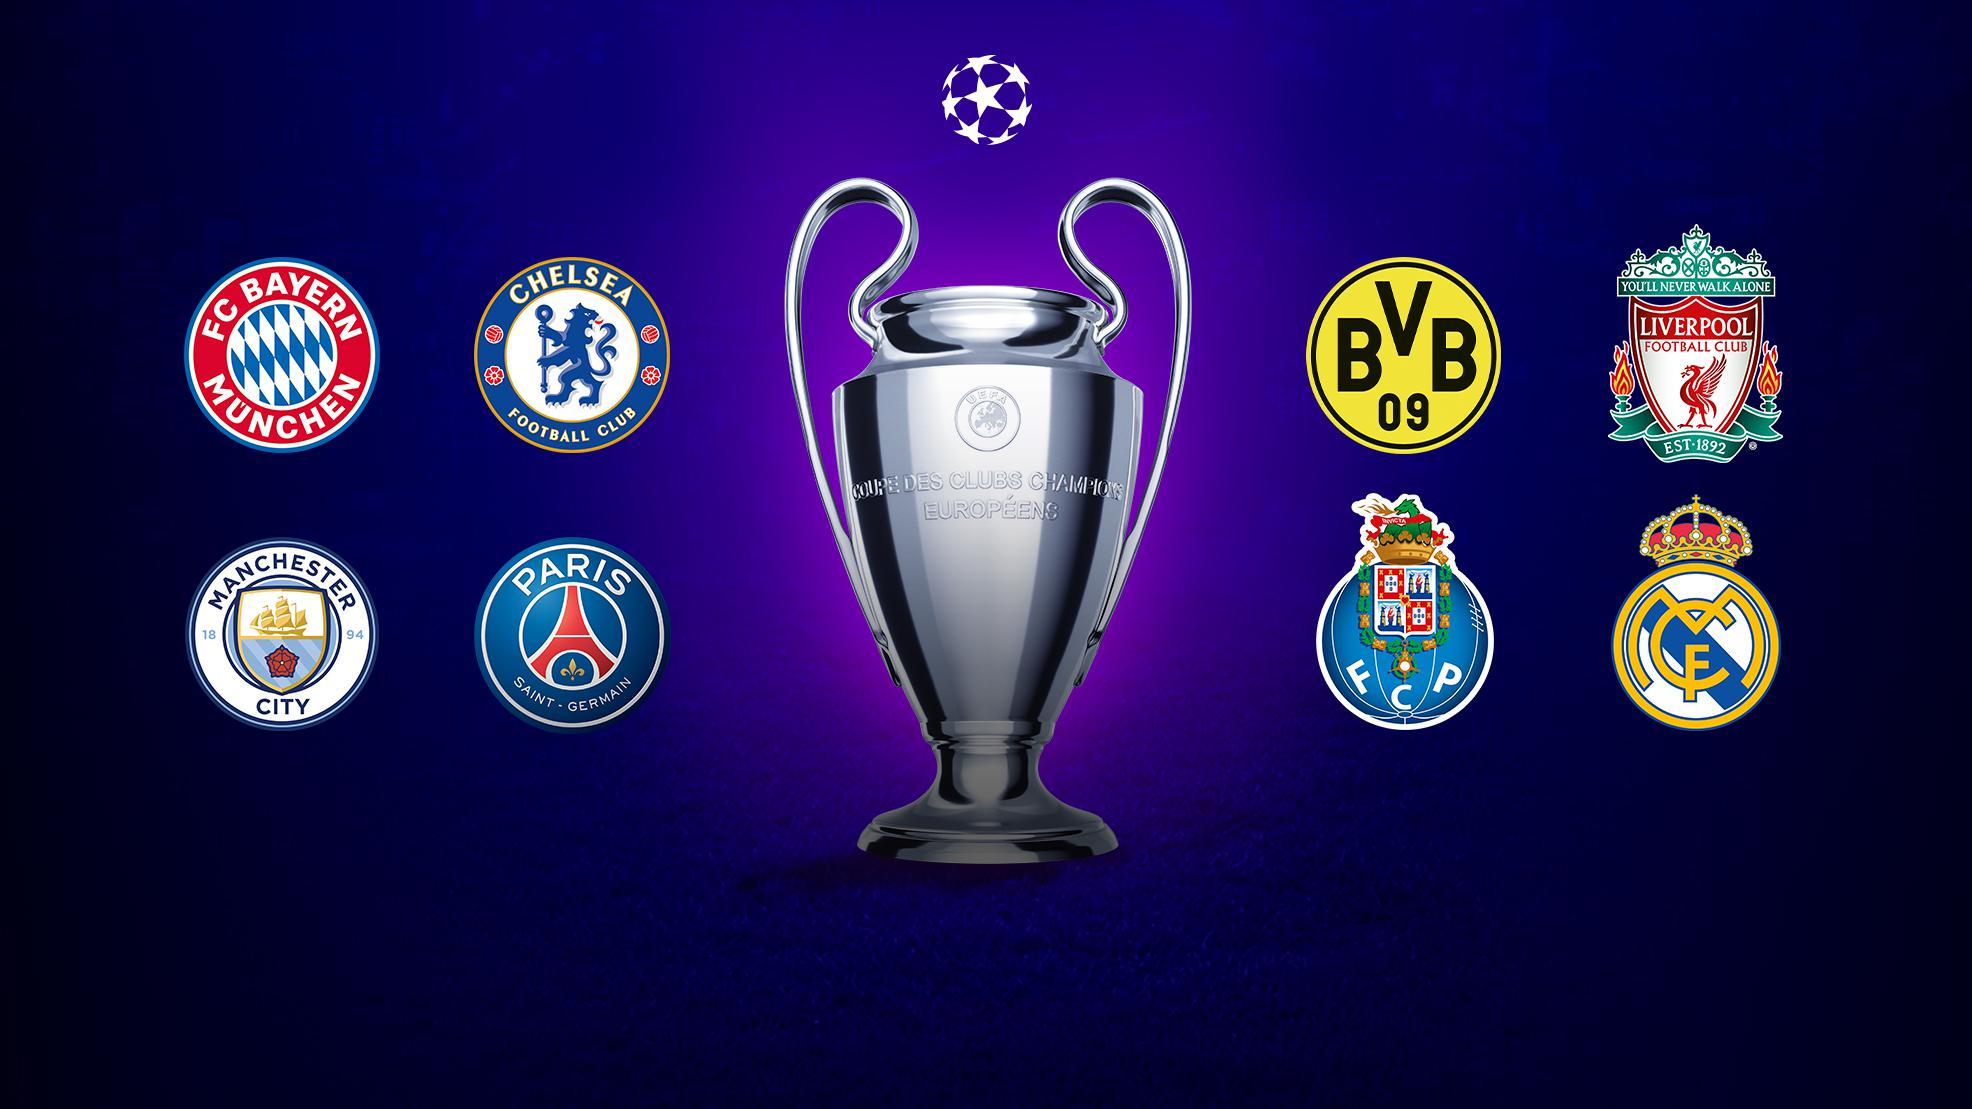 Cuartos De Final De La Champions Bayern Chelsea Dortmund Liverpool Man City Paris Oporto Real Madrid Uefa Champions League Uefa Com